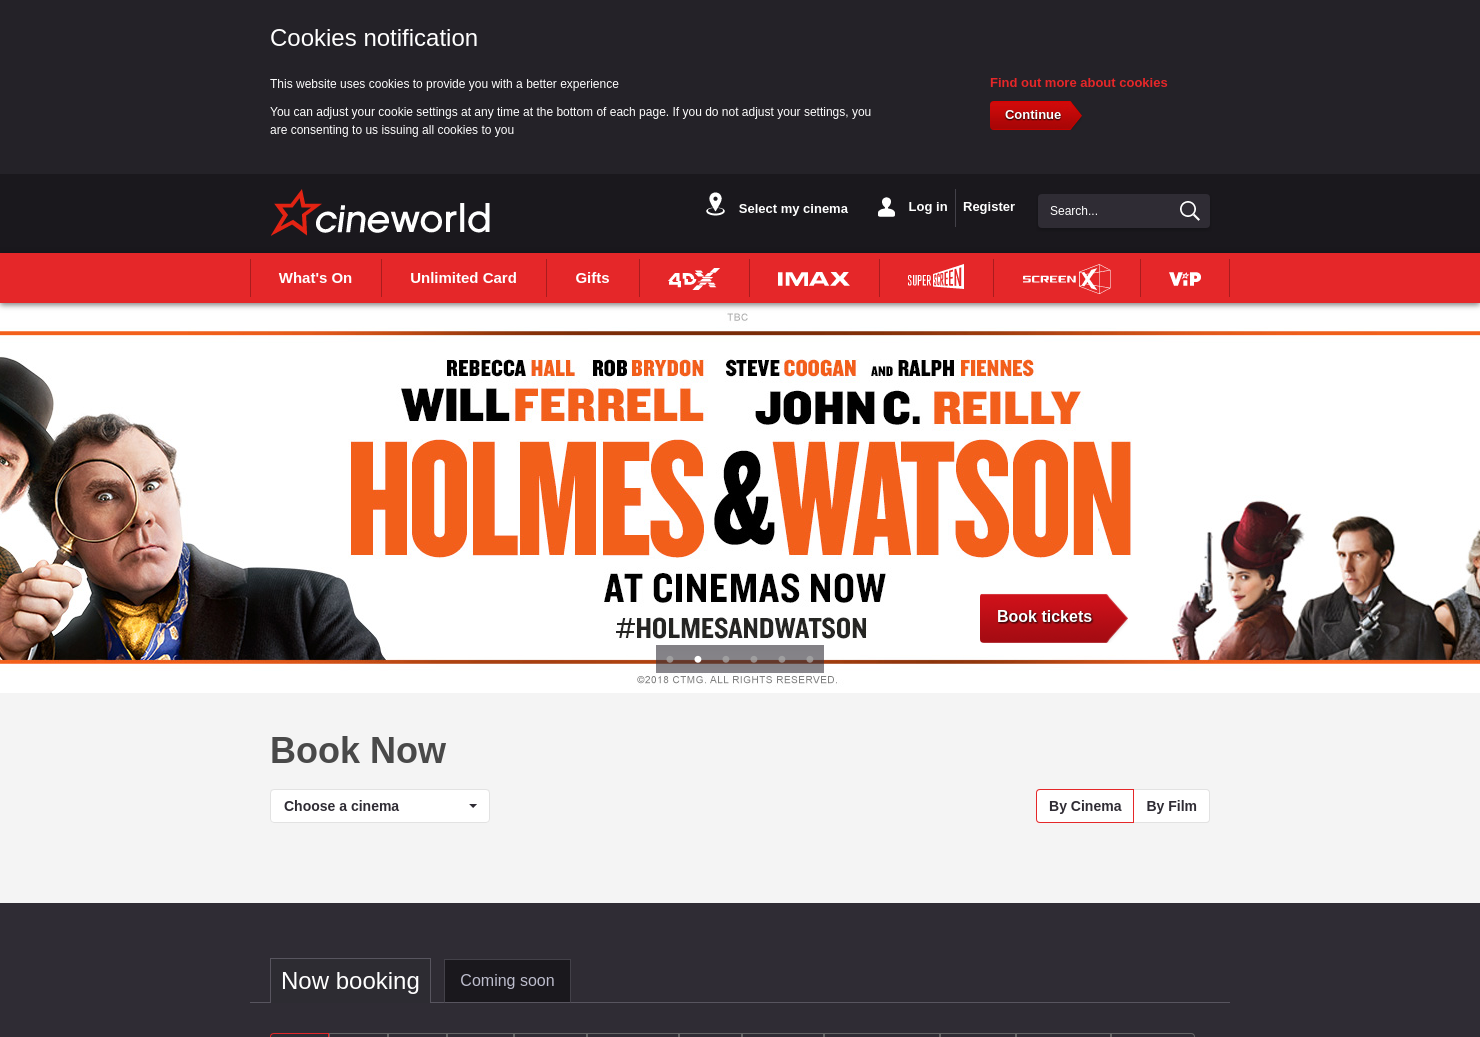 Cineworld Home Page